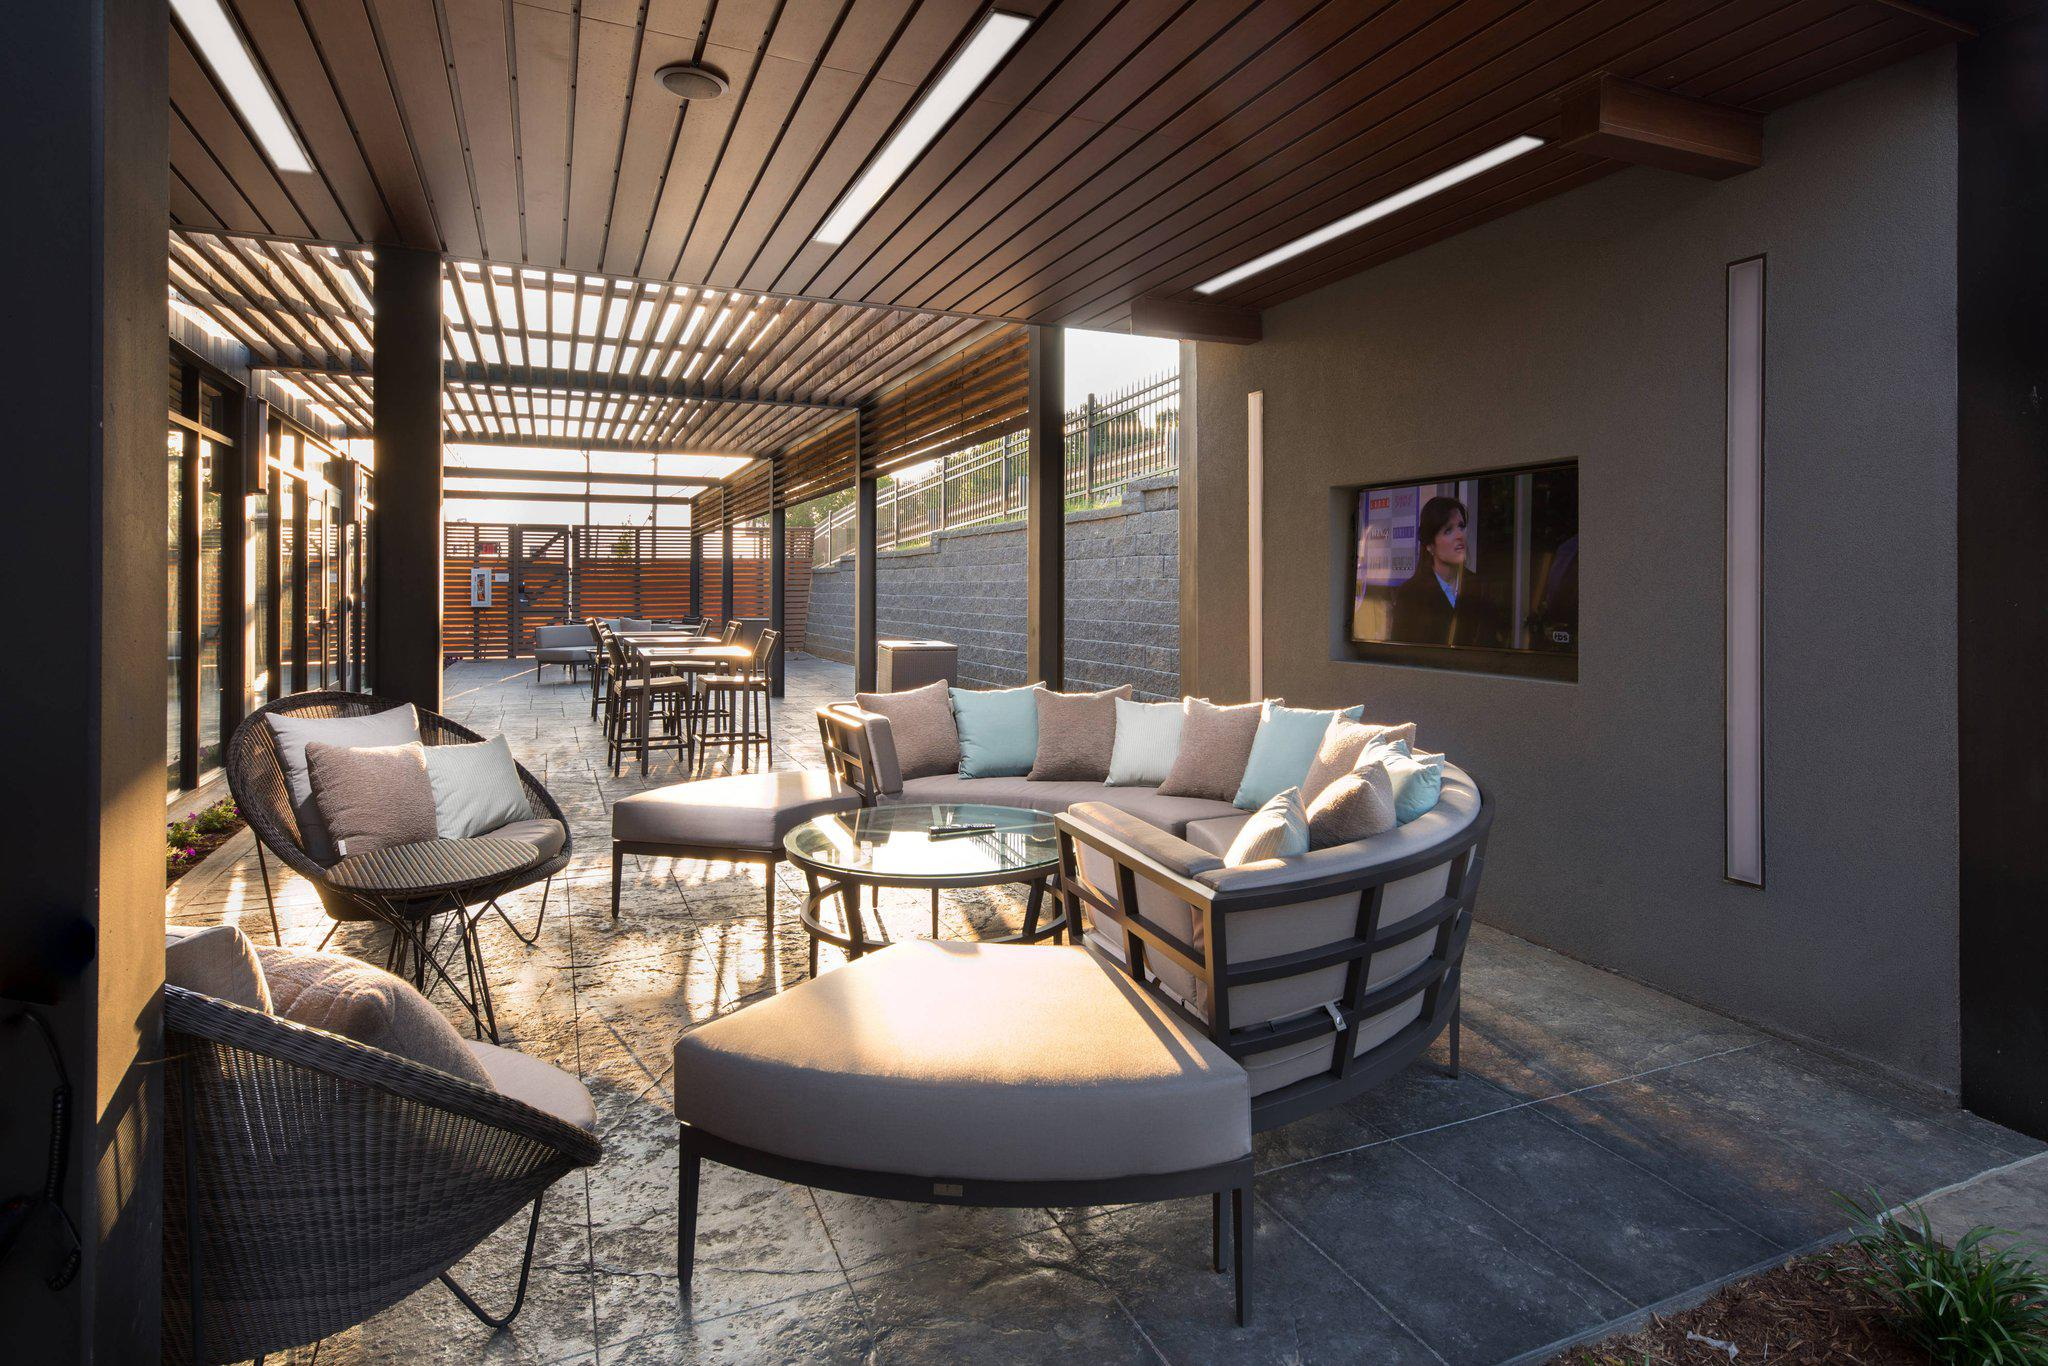 Courtyard by Marriott Russellville